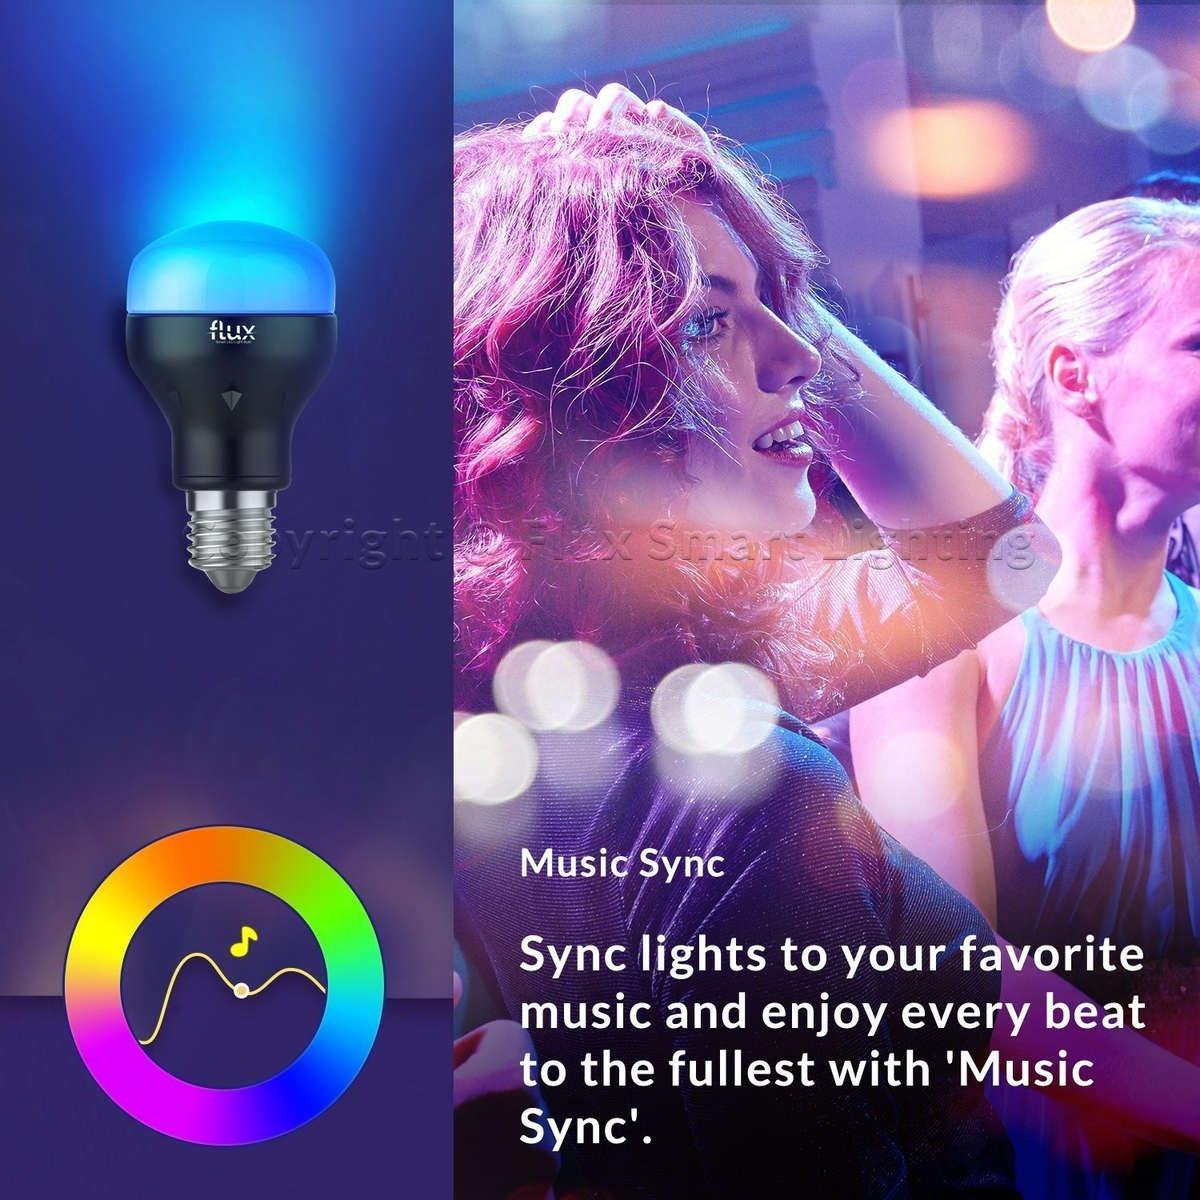 Flux WiFi Smart LED Light Bulb, 2nd Generation